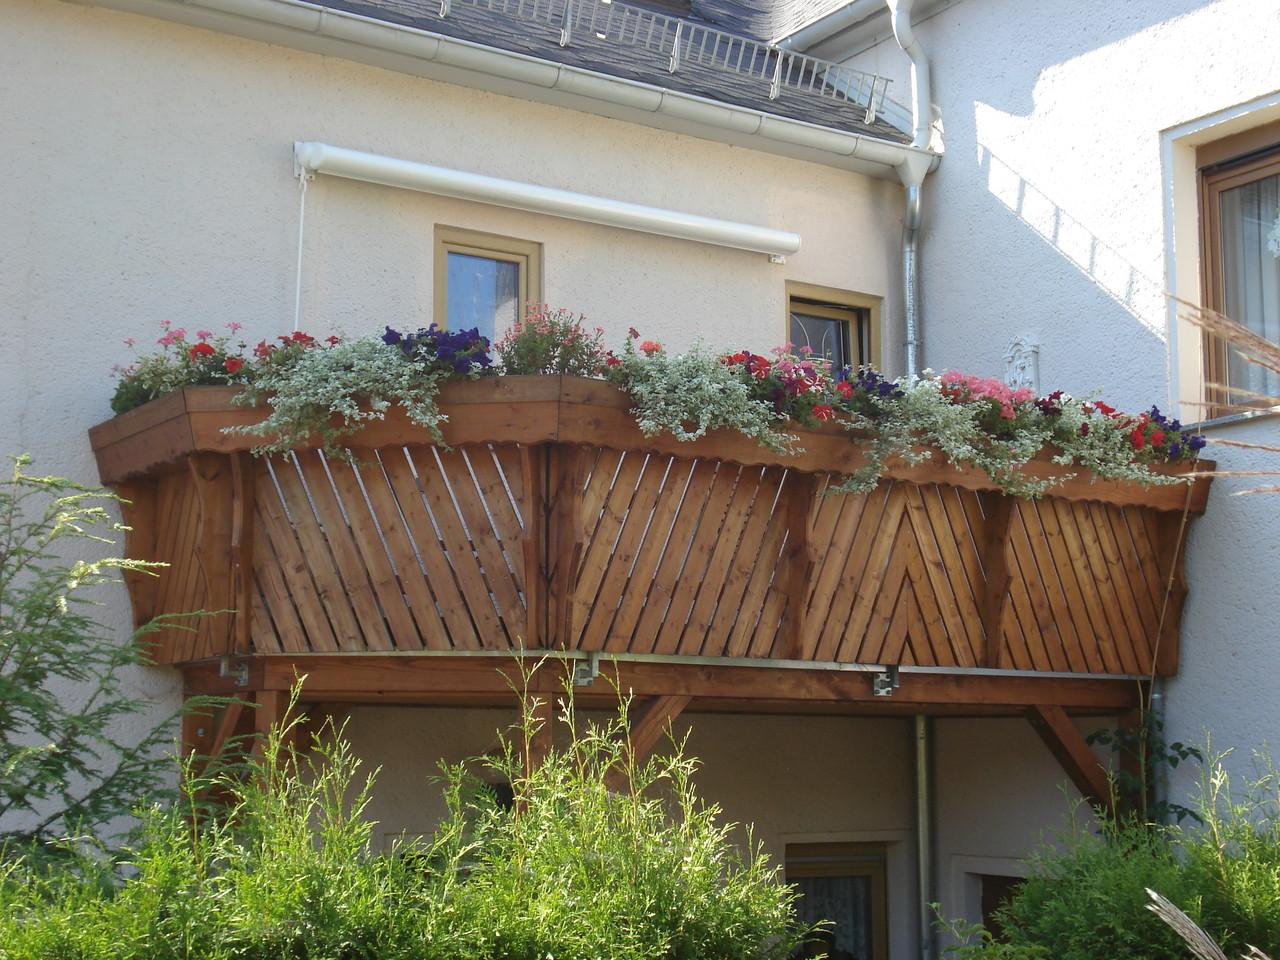 Anbau eines Balkons